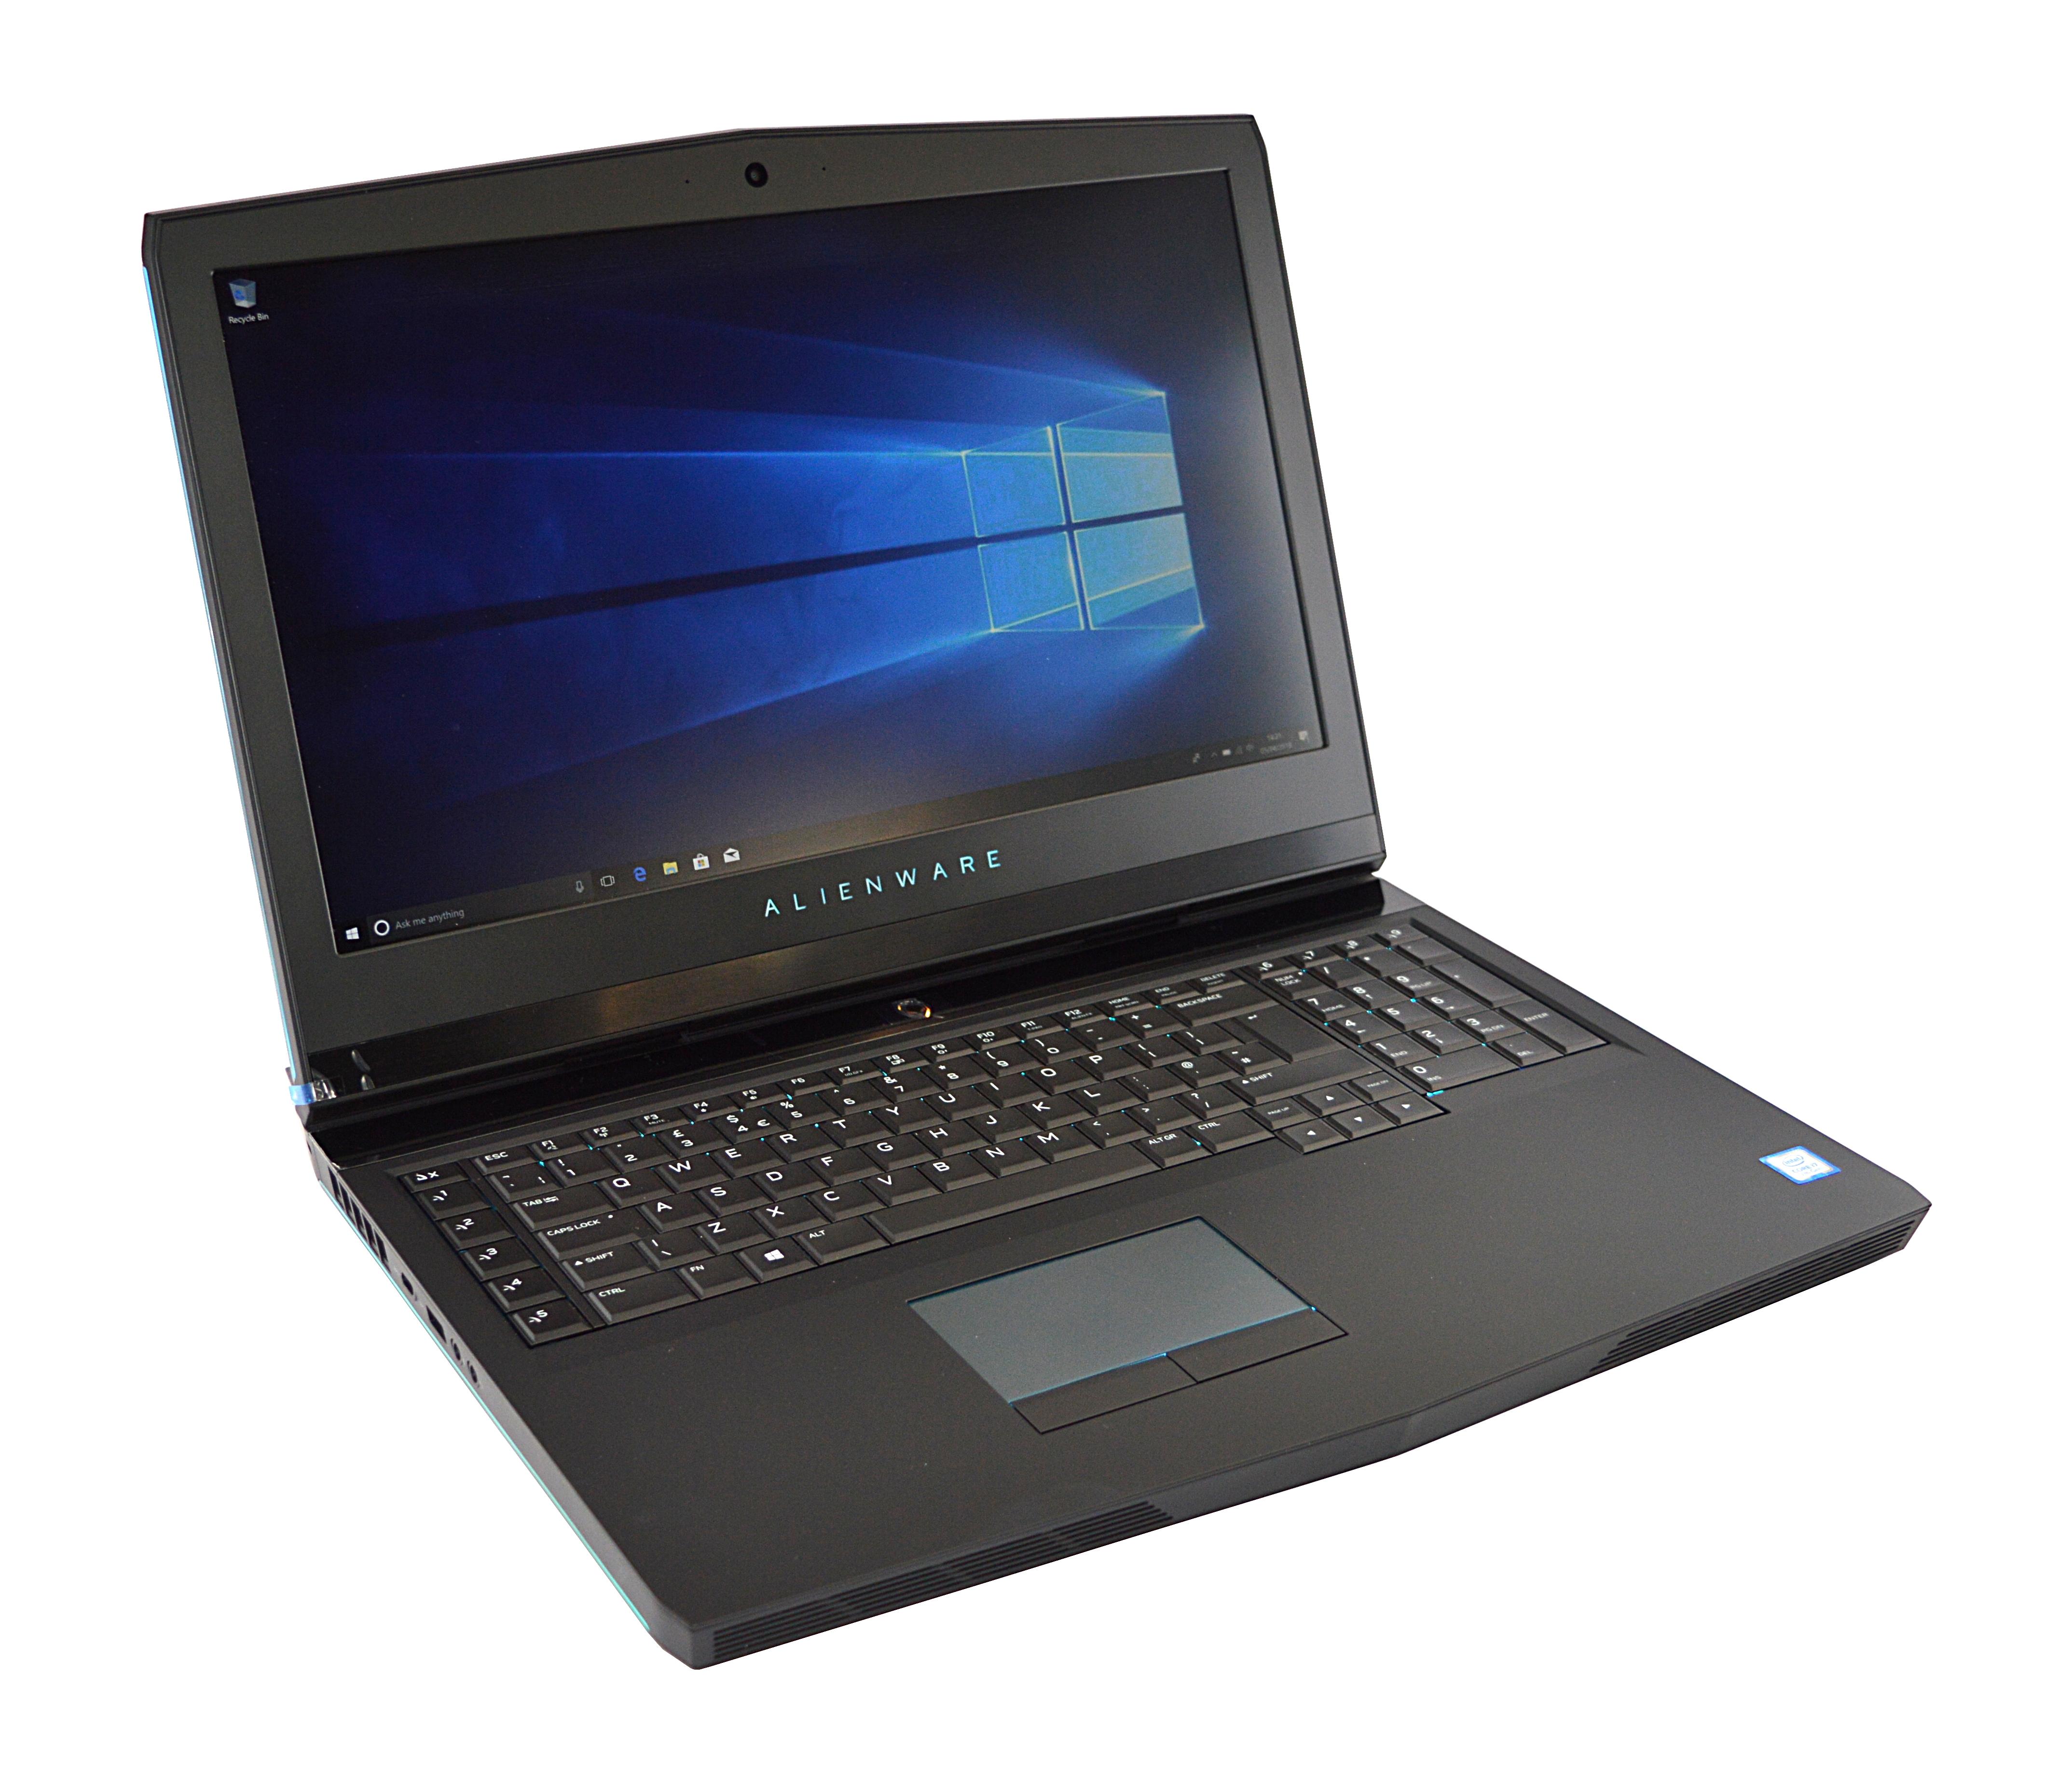 Dell Alienware 17 R4 Laptop Core i7-7820HK 16GB RAM 256GB SSD 2TB HDD Windows 10